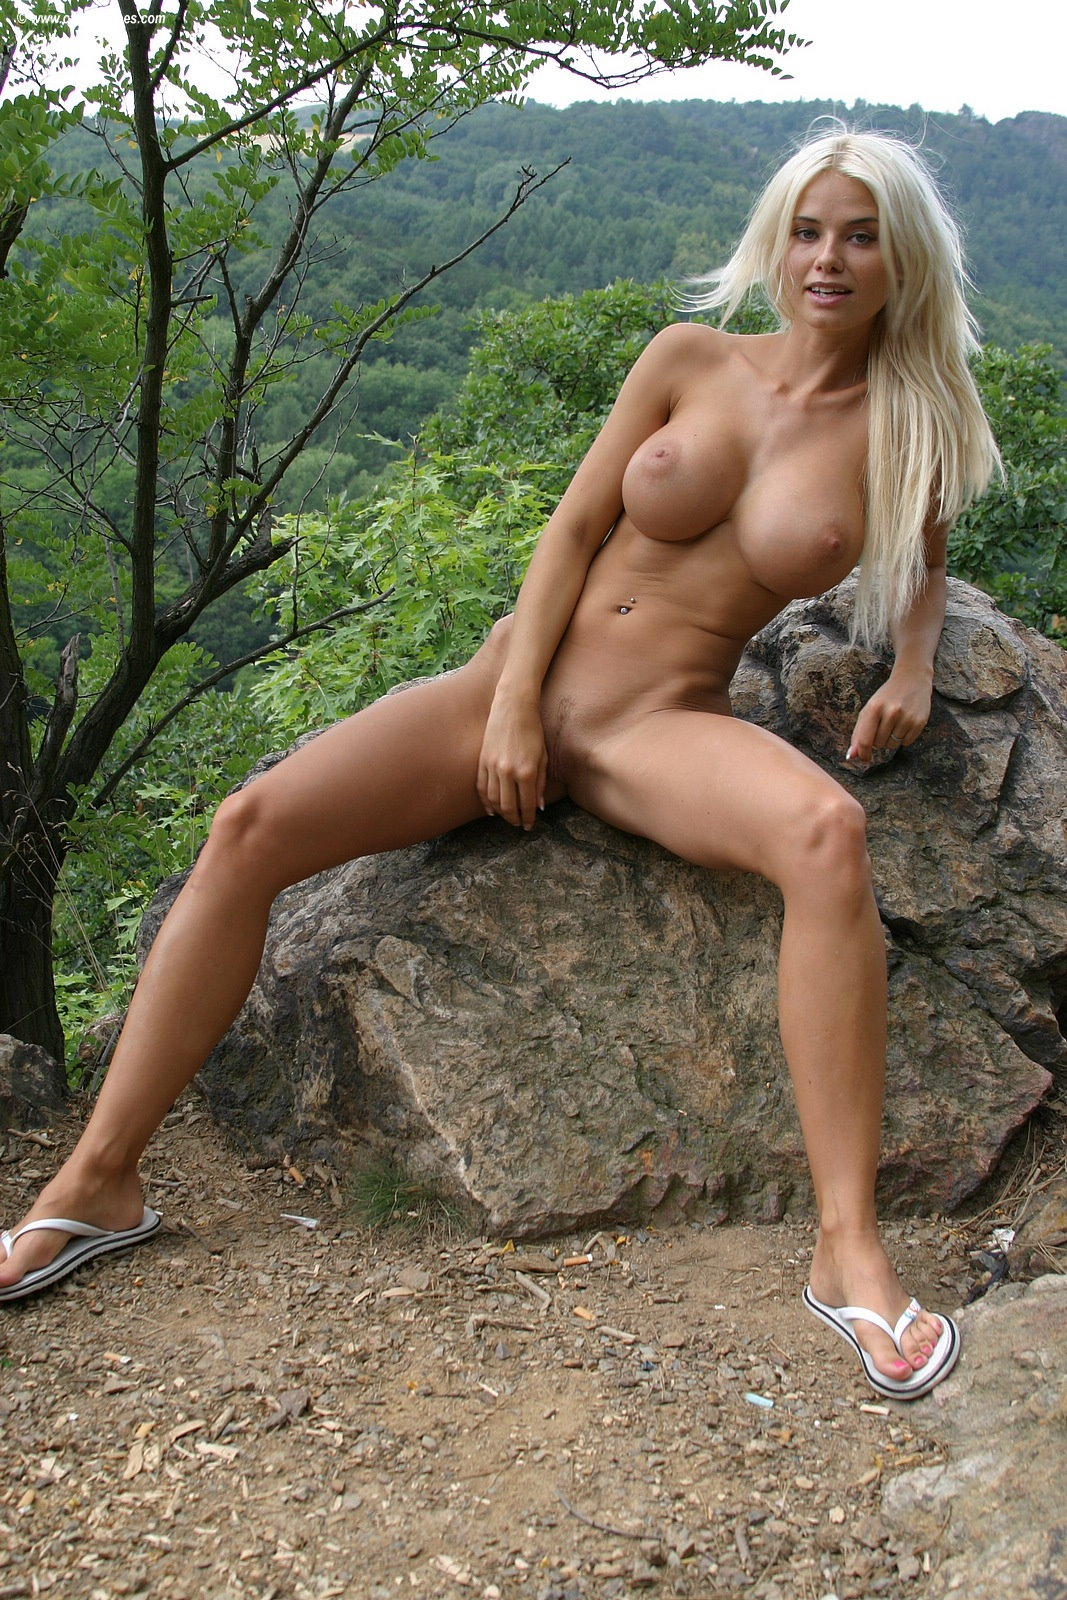 katerina-nude-mountain-lingerie-huge-tits-blonde-16